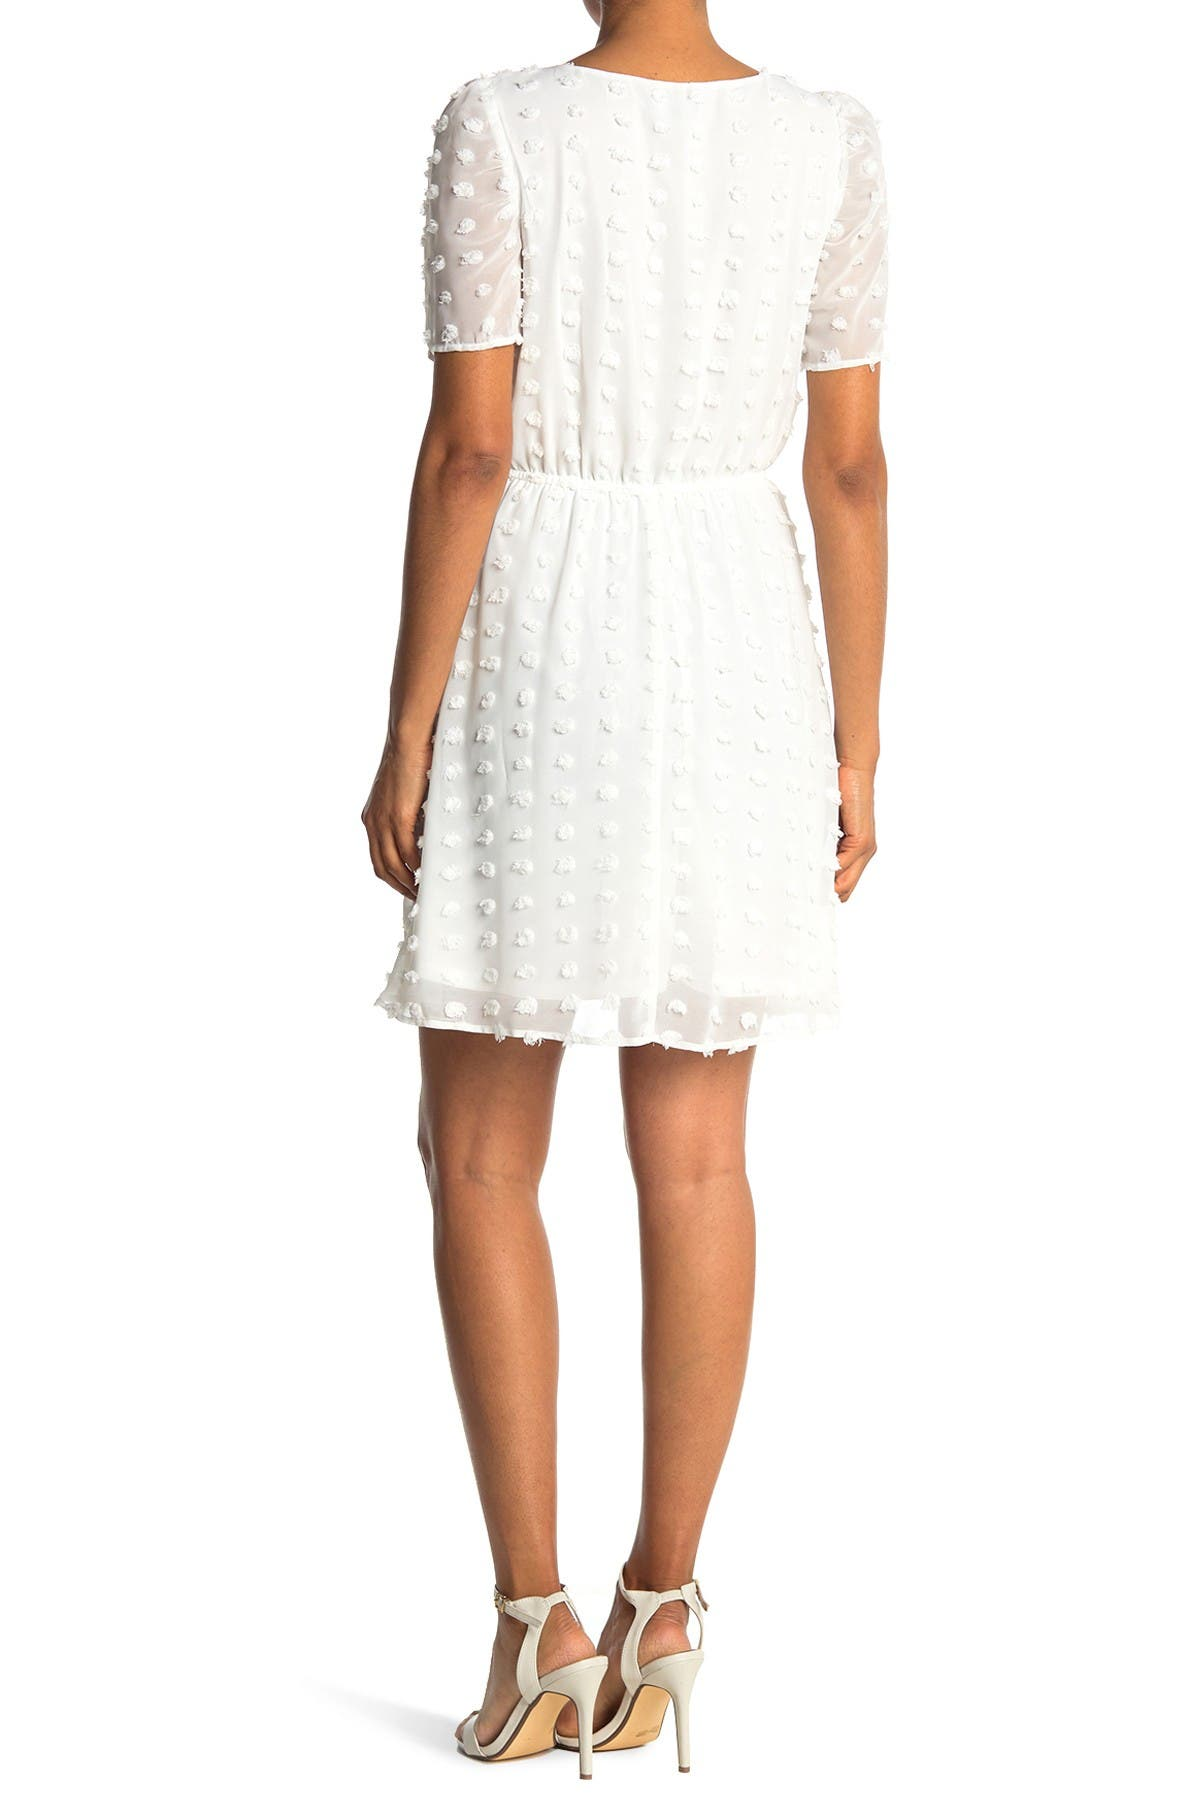 Image of KENEDIK Clip Dot Short Sleeve Dress